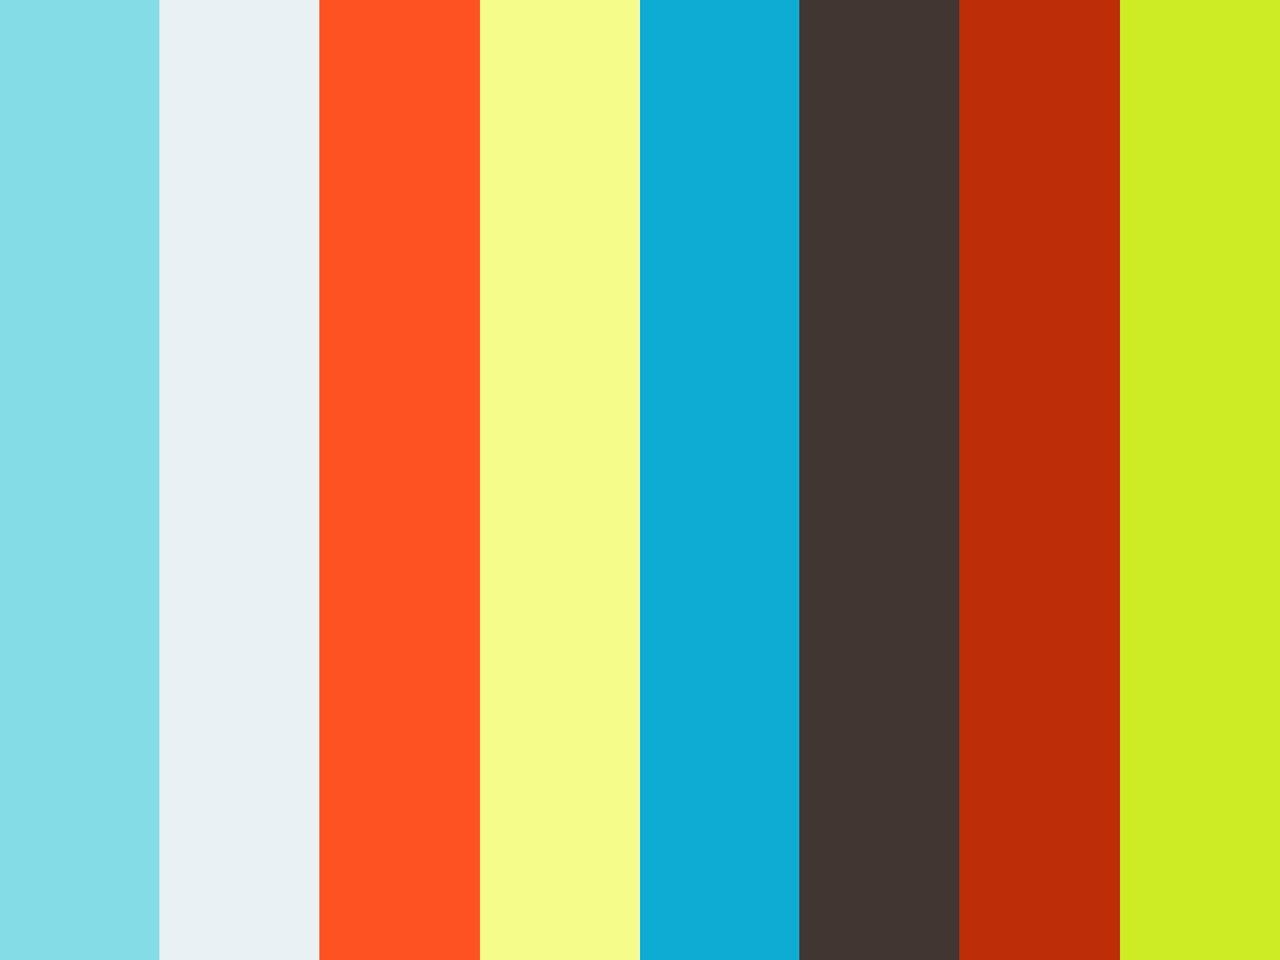 Paul Green - Rage (Obf)